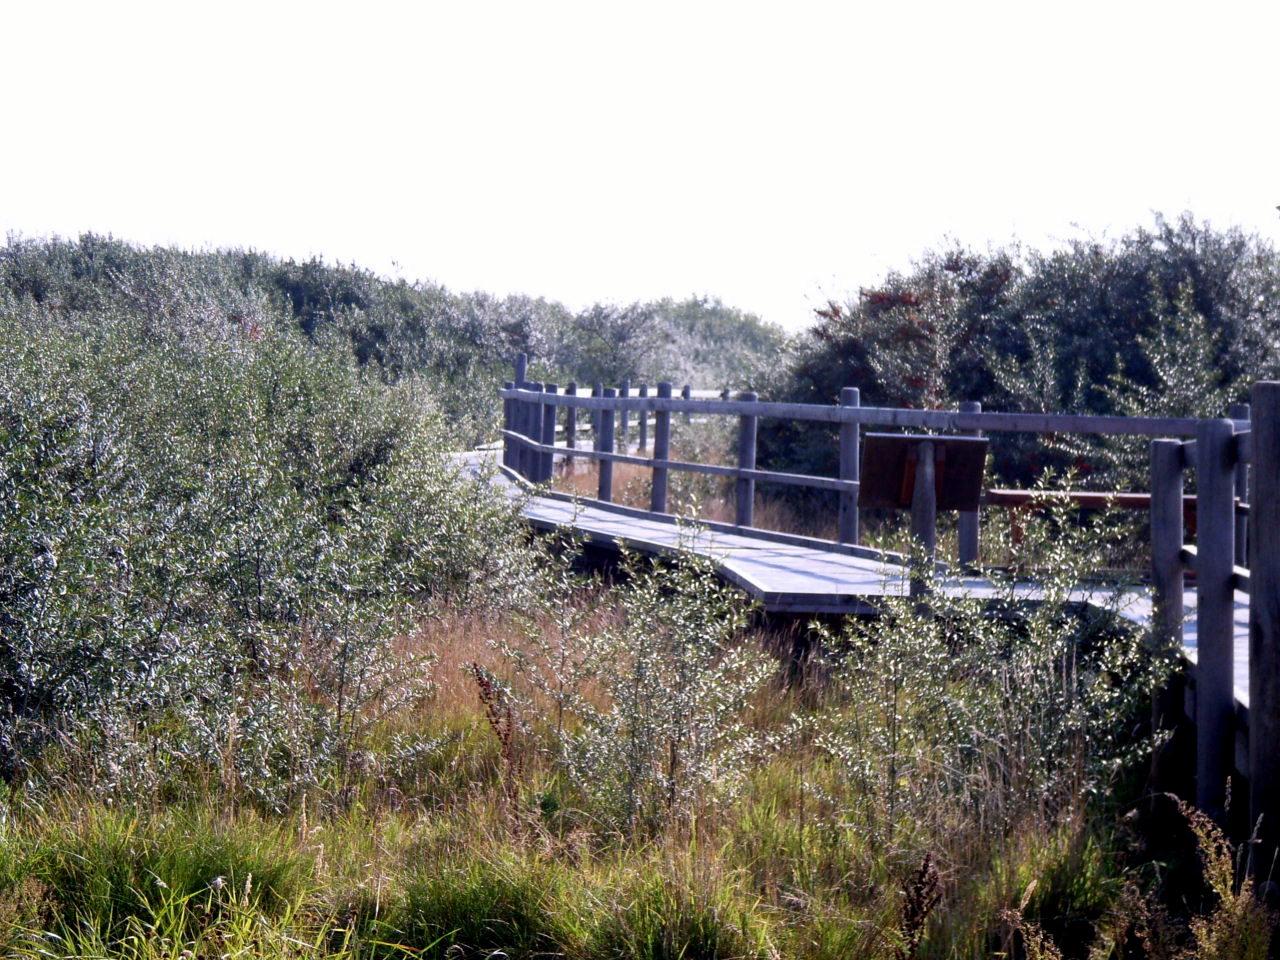 Naturlehrpfad Speicherkoog Nationalpark Wattenmeer